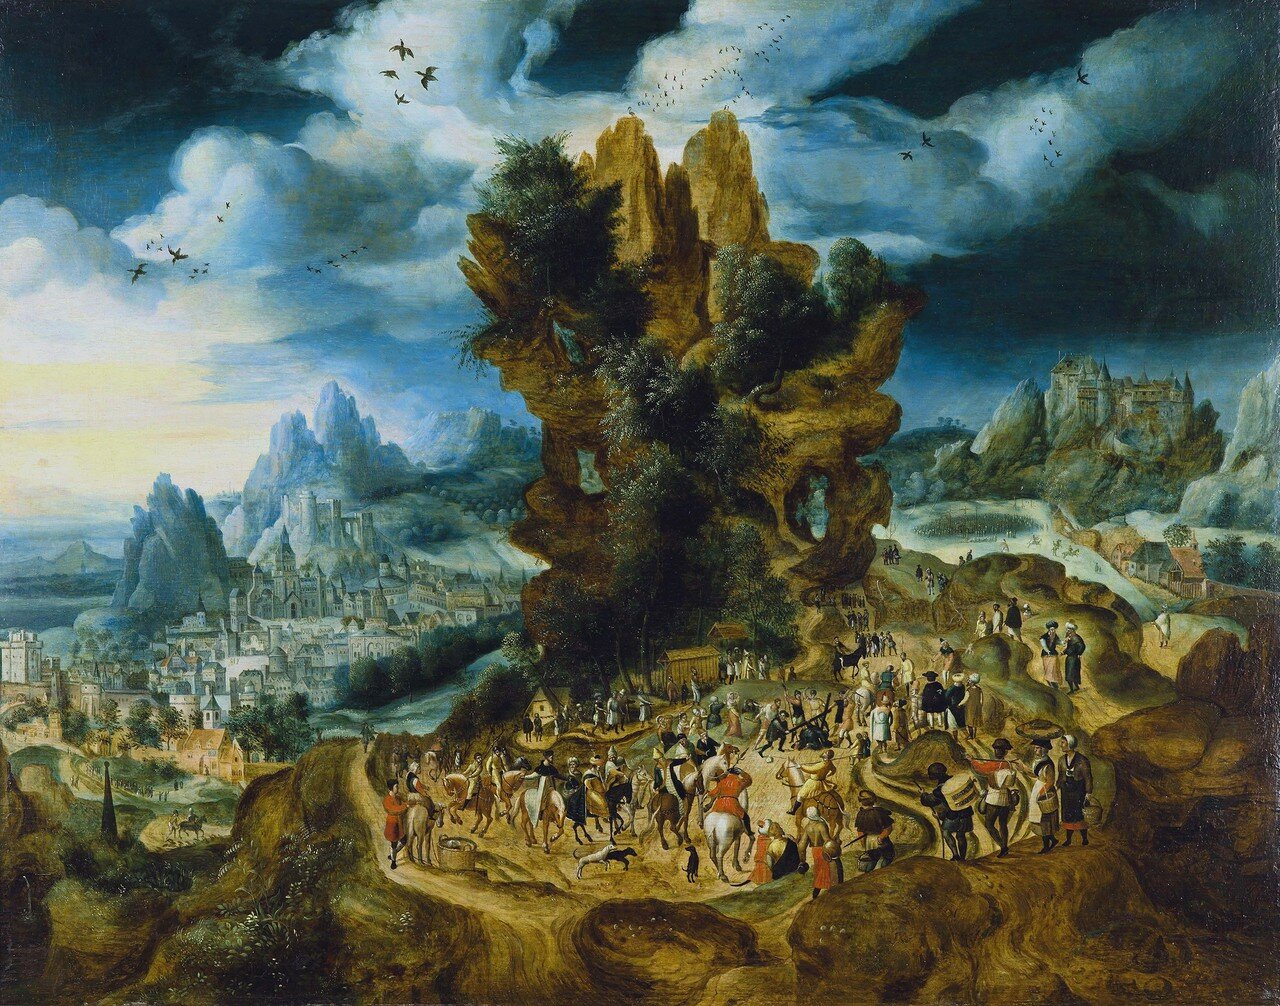 Christ bearing the cross, by Herrie met de Bles